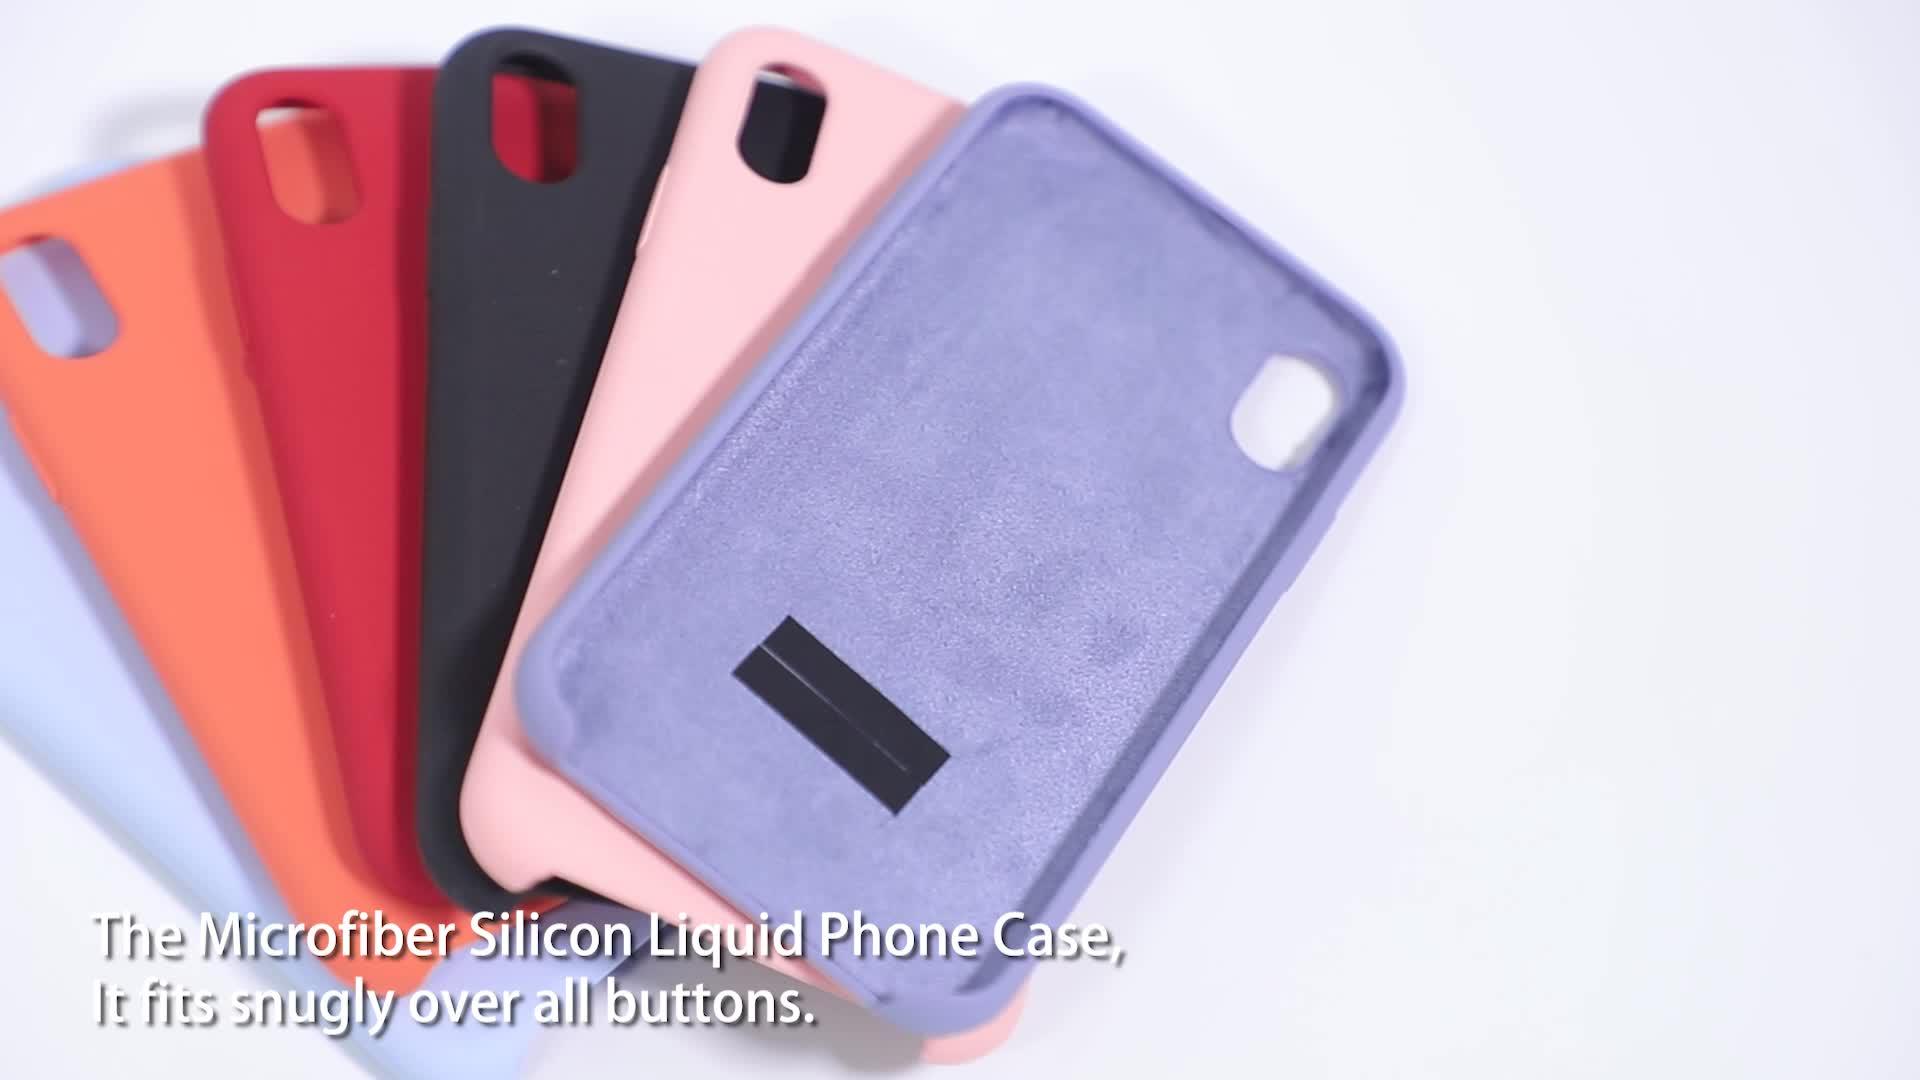 Microfiber liquid silicone case for Apple Iphone 7 8 X Plus Original Shockproof soft rubber case with logo